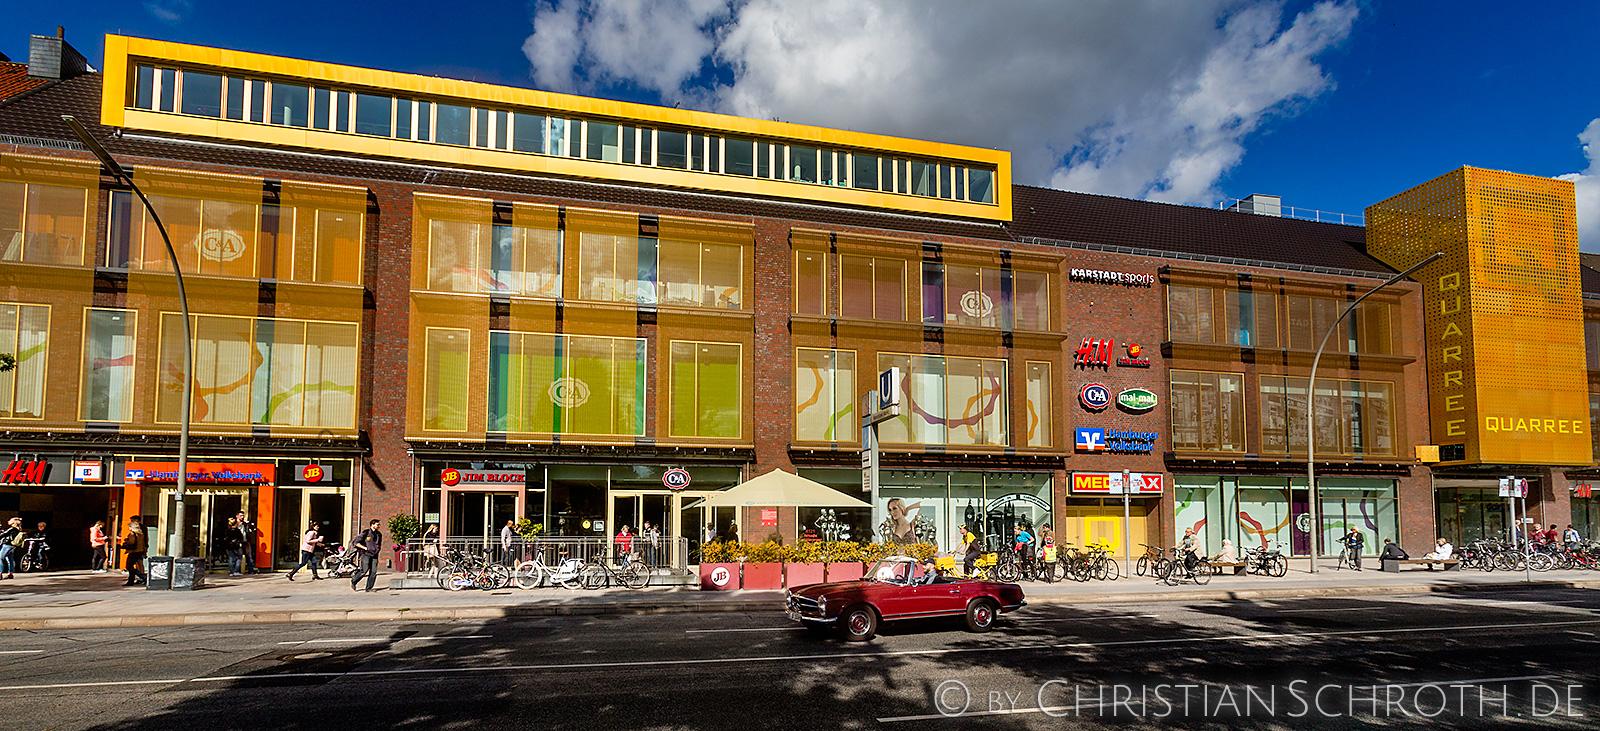 Einkaufszentrum Quarree